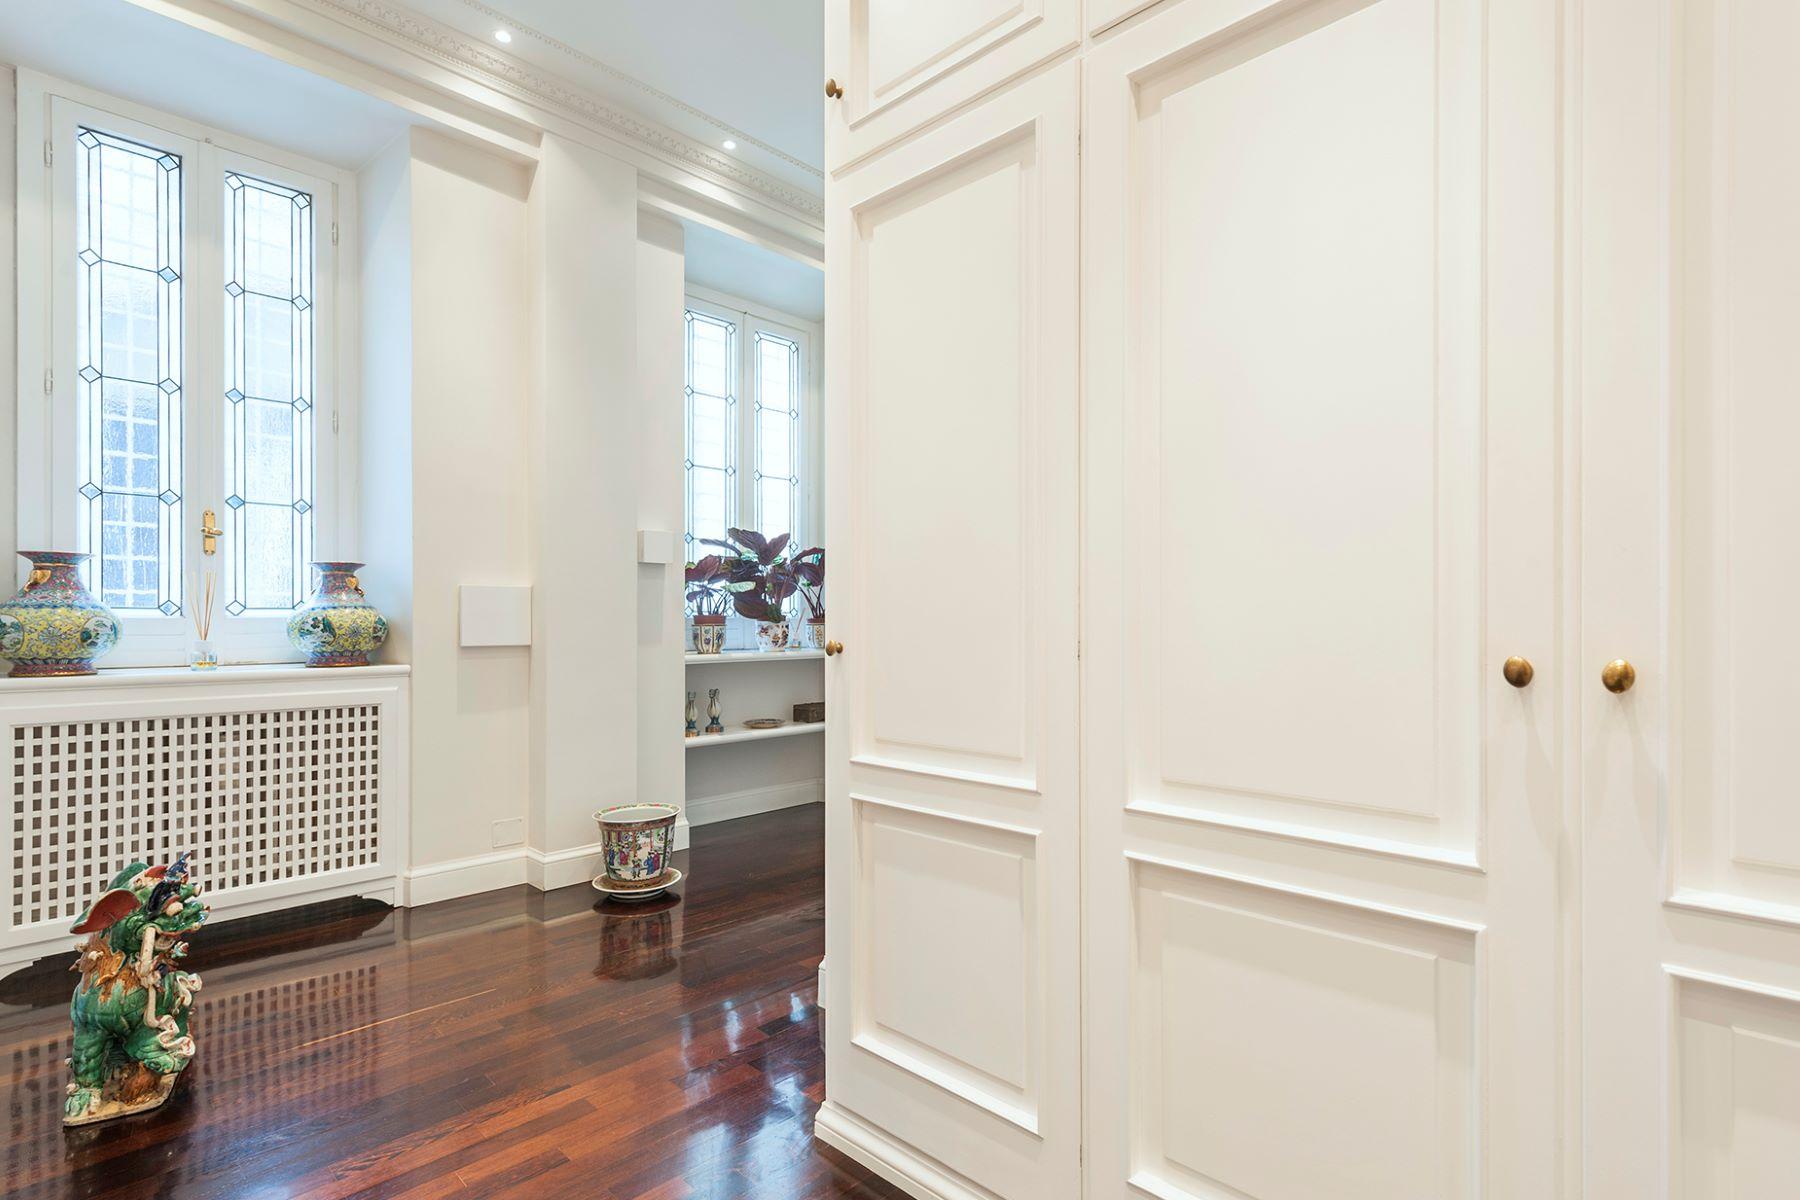 Apartment for Sale at Prestigious top floor at Porta Pia Via Nomentana Rome, Rome, 00198 Italy